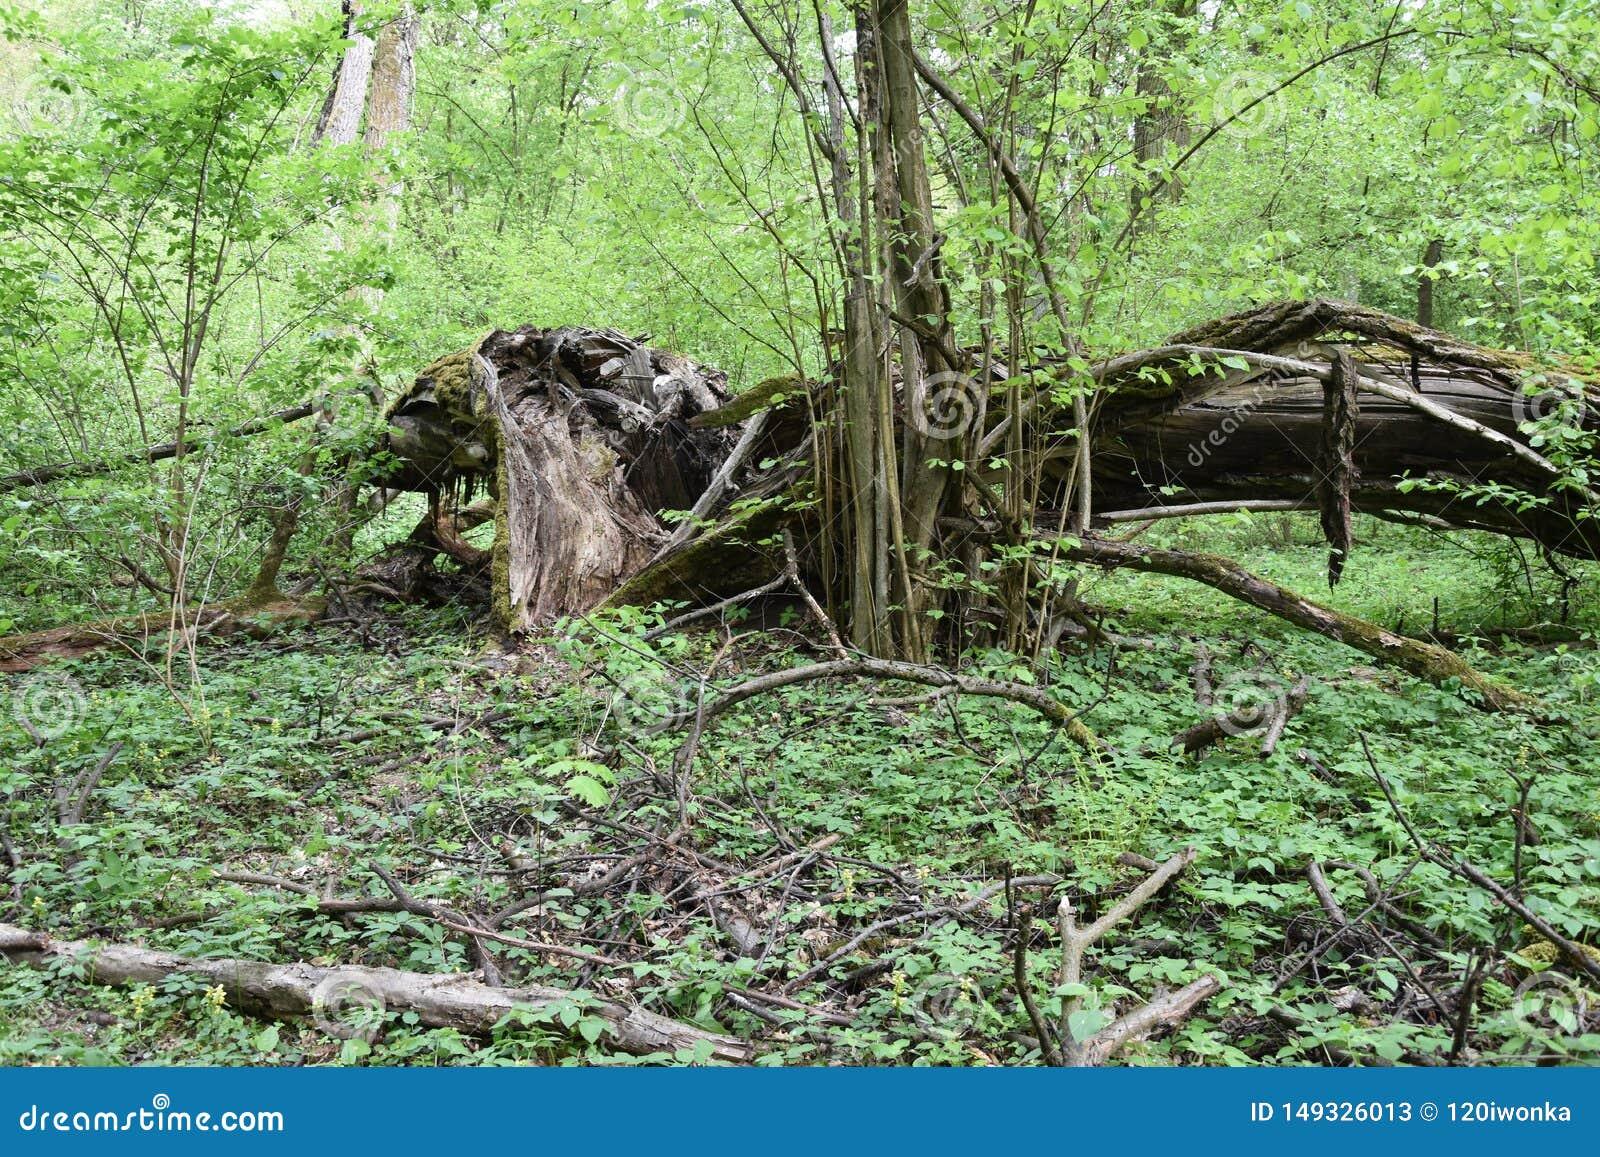 The Morasko meteorite nature reserve, europe